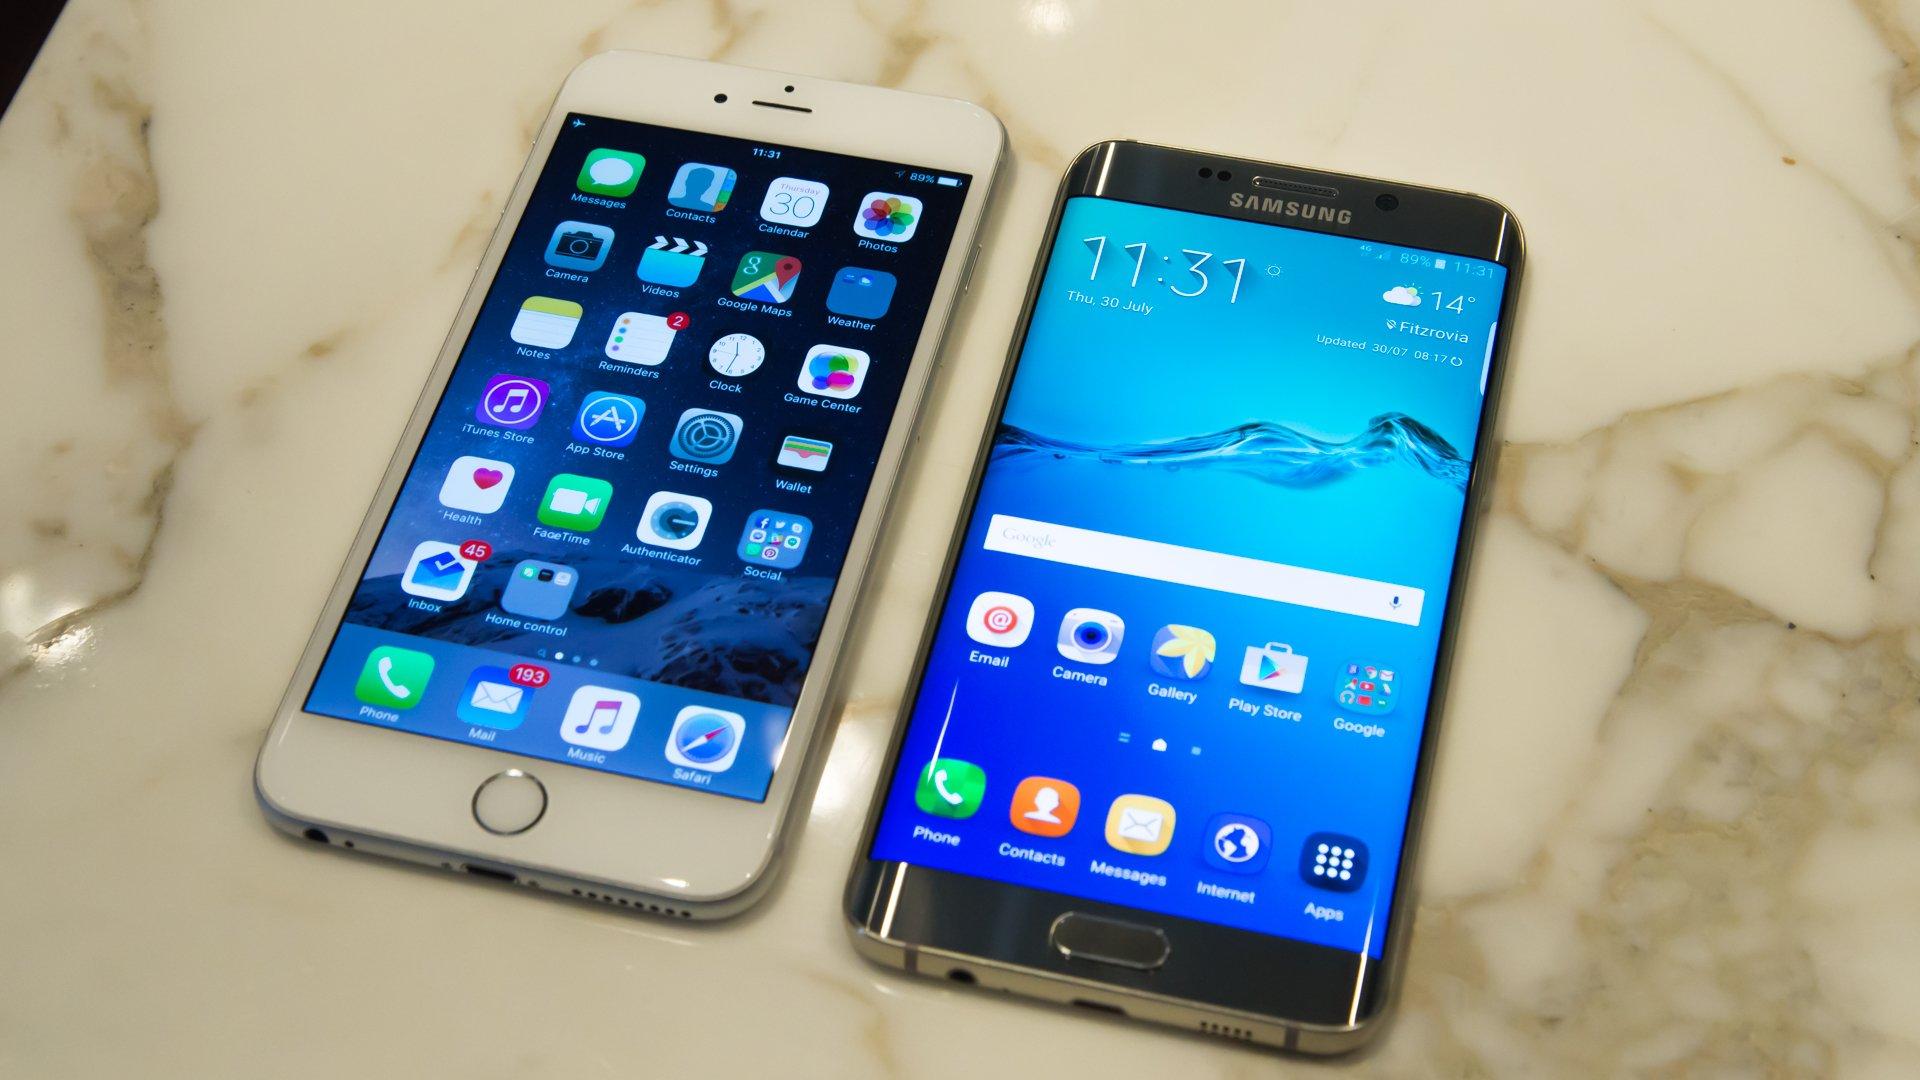 SAMSUNG S6 EDGE VS IPHONE 6 PLUS BATTERY